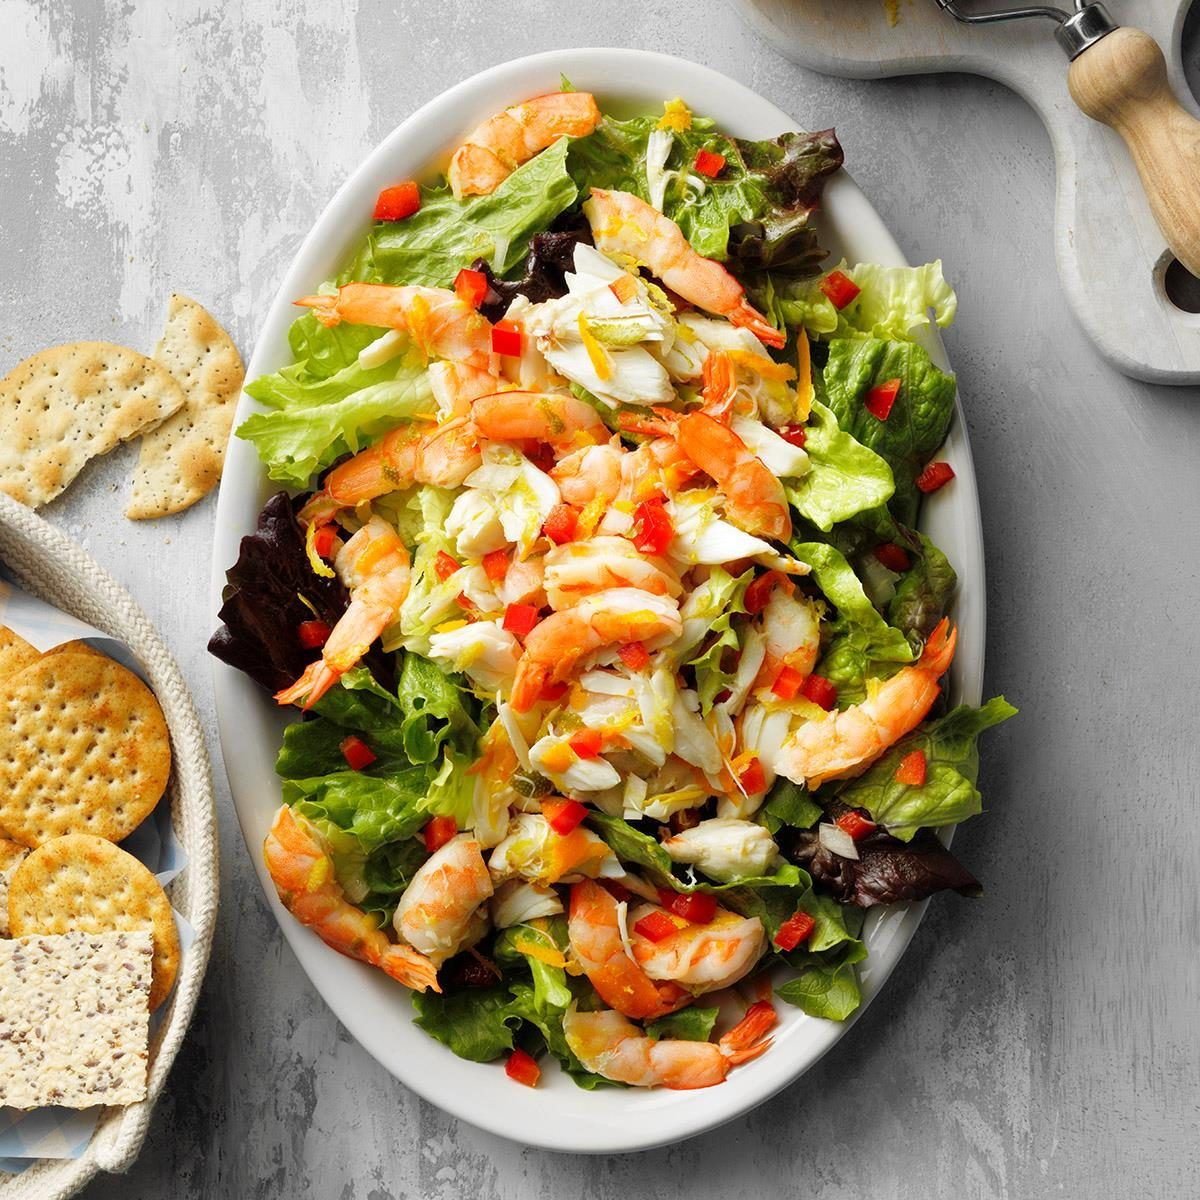 Easy Citrus Seafood Salad Exps Tohjj20 242786 E02 05 1b 1